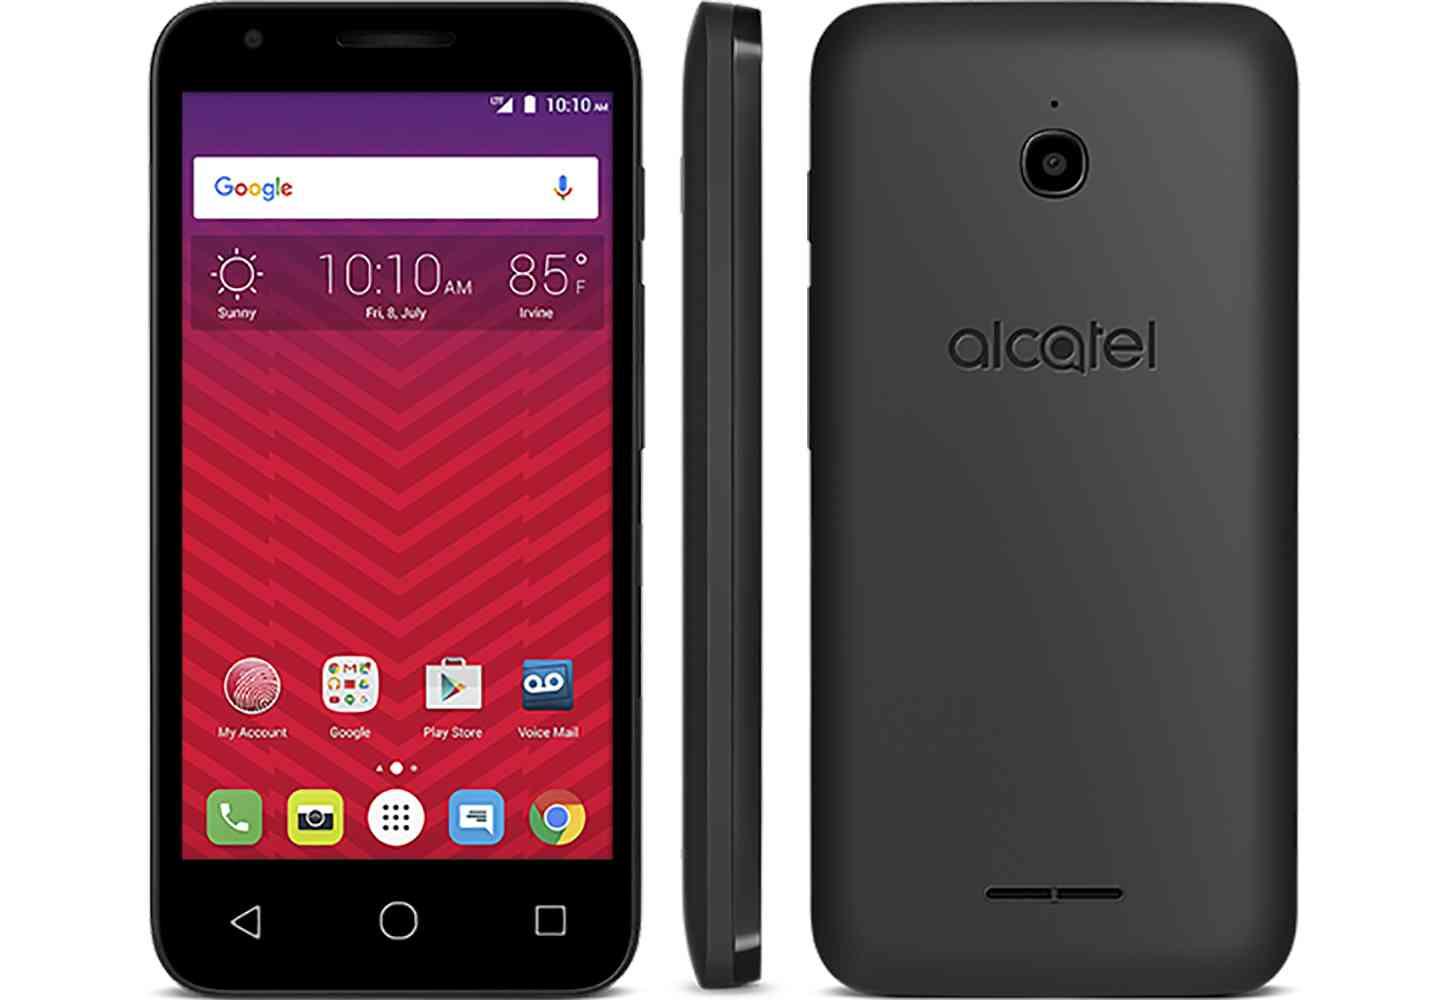 Alcatel Dawn Virgin Mobile official